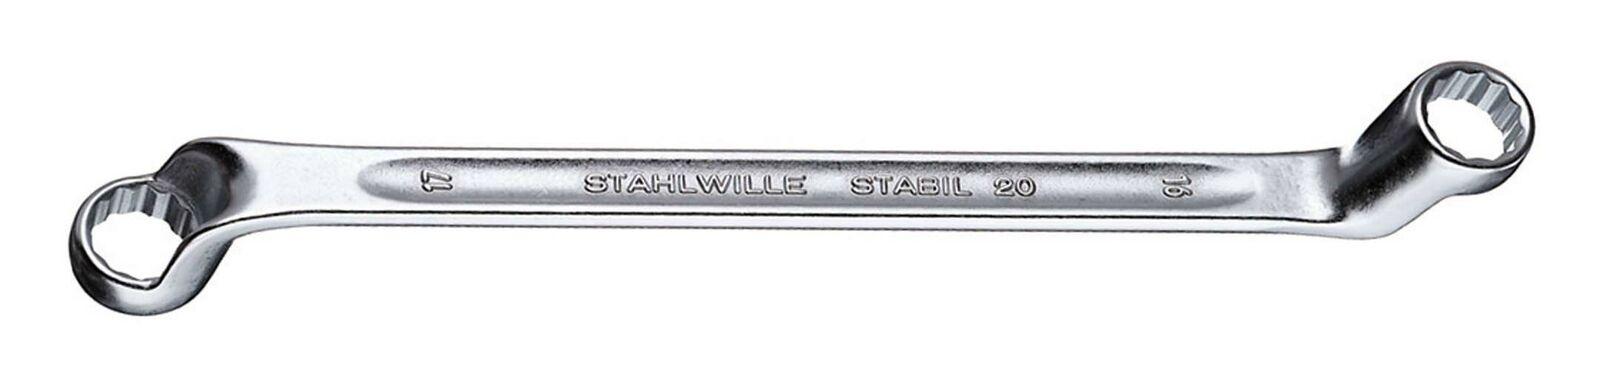 Stahlwille Doppelringschlüssel DIN838 36 x 41 mm - 20 36 X 41